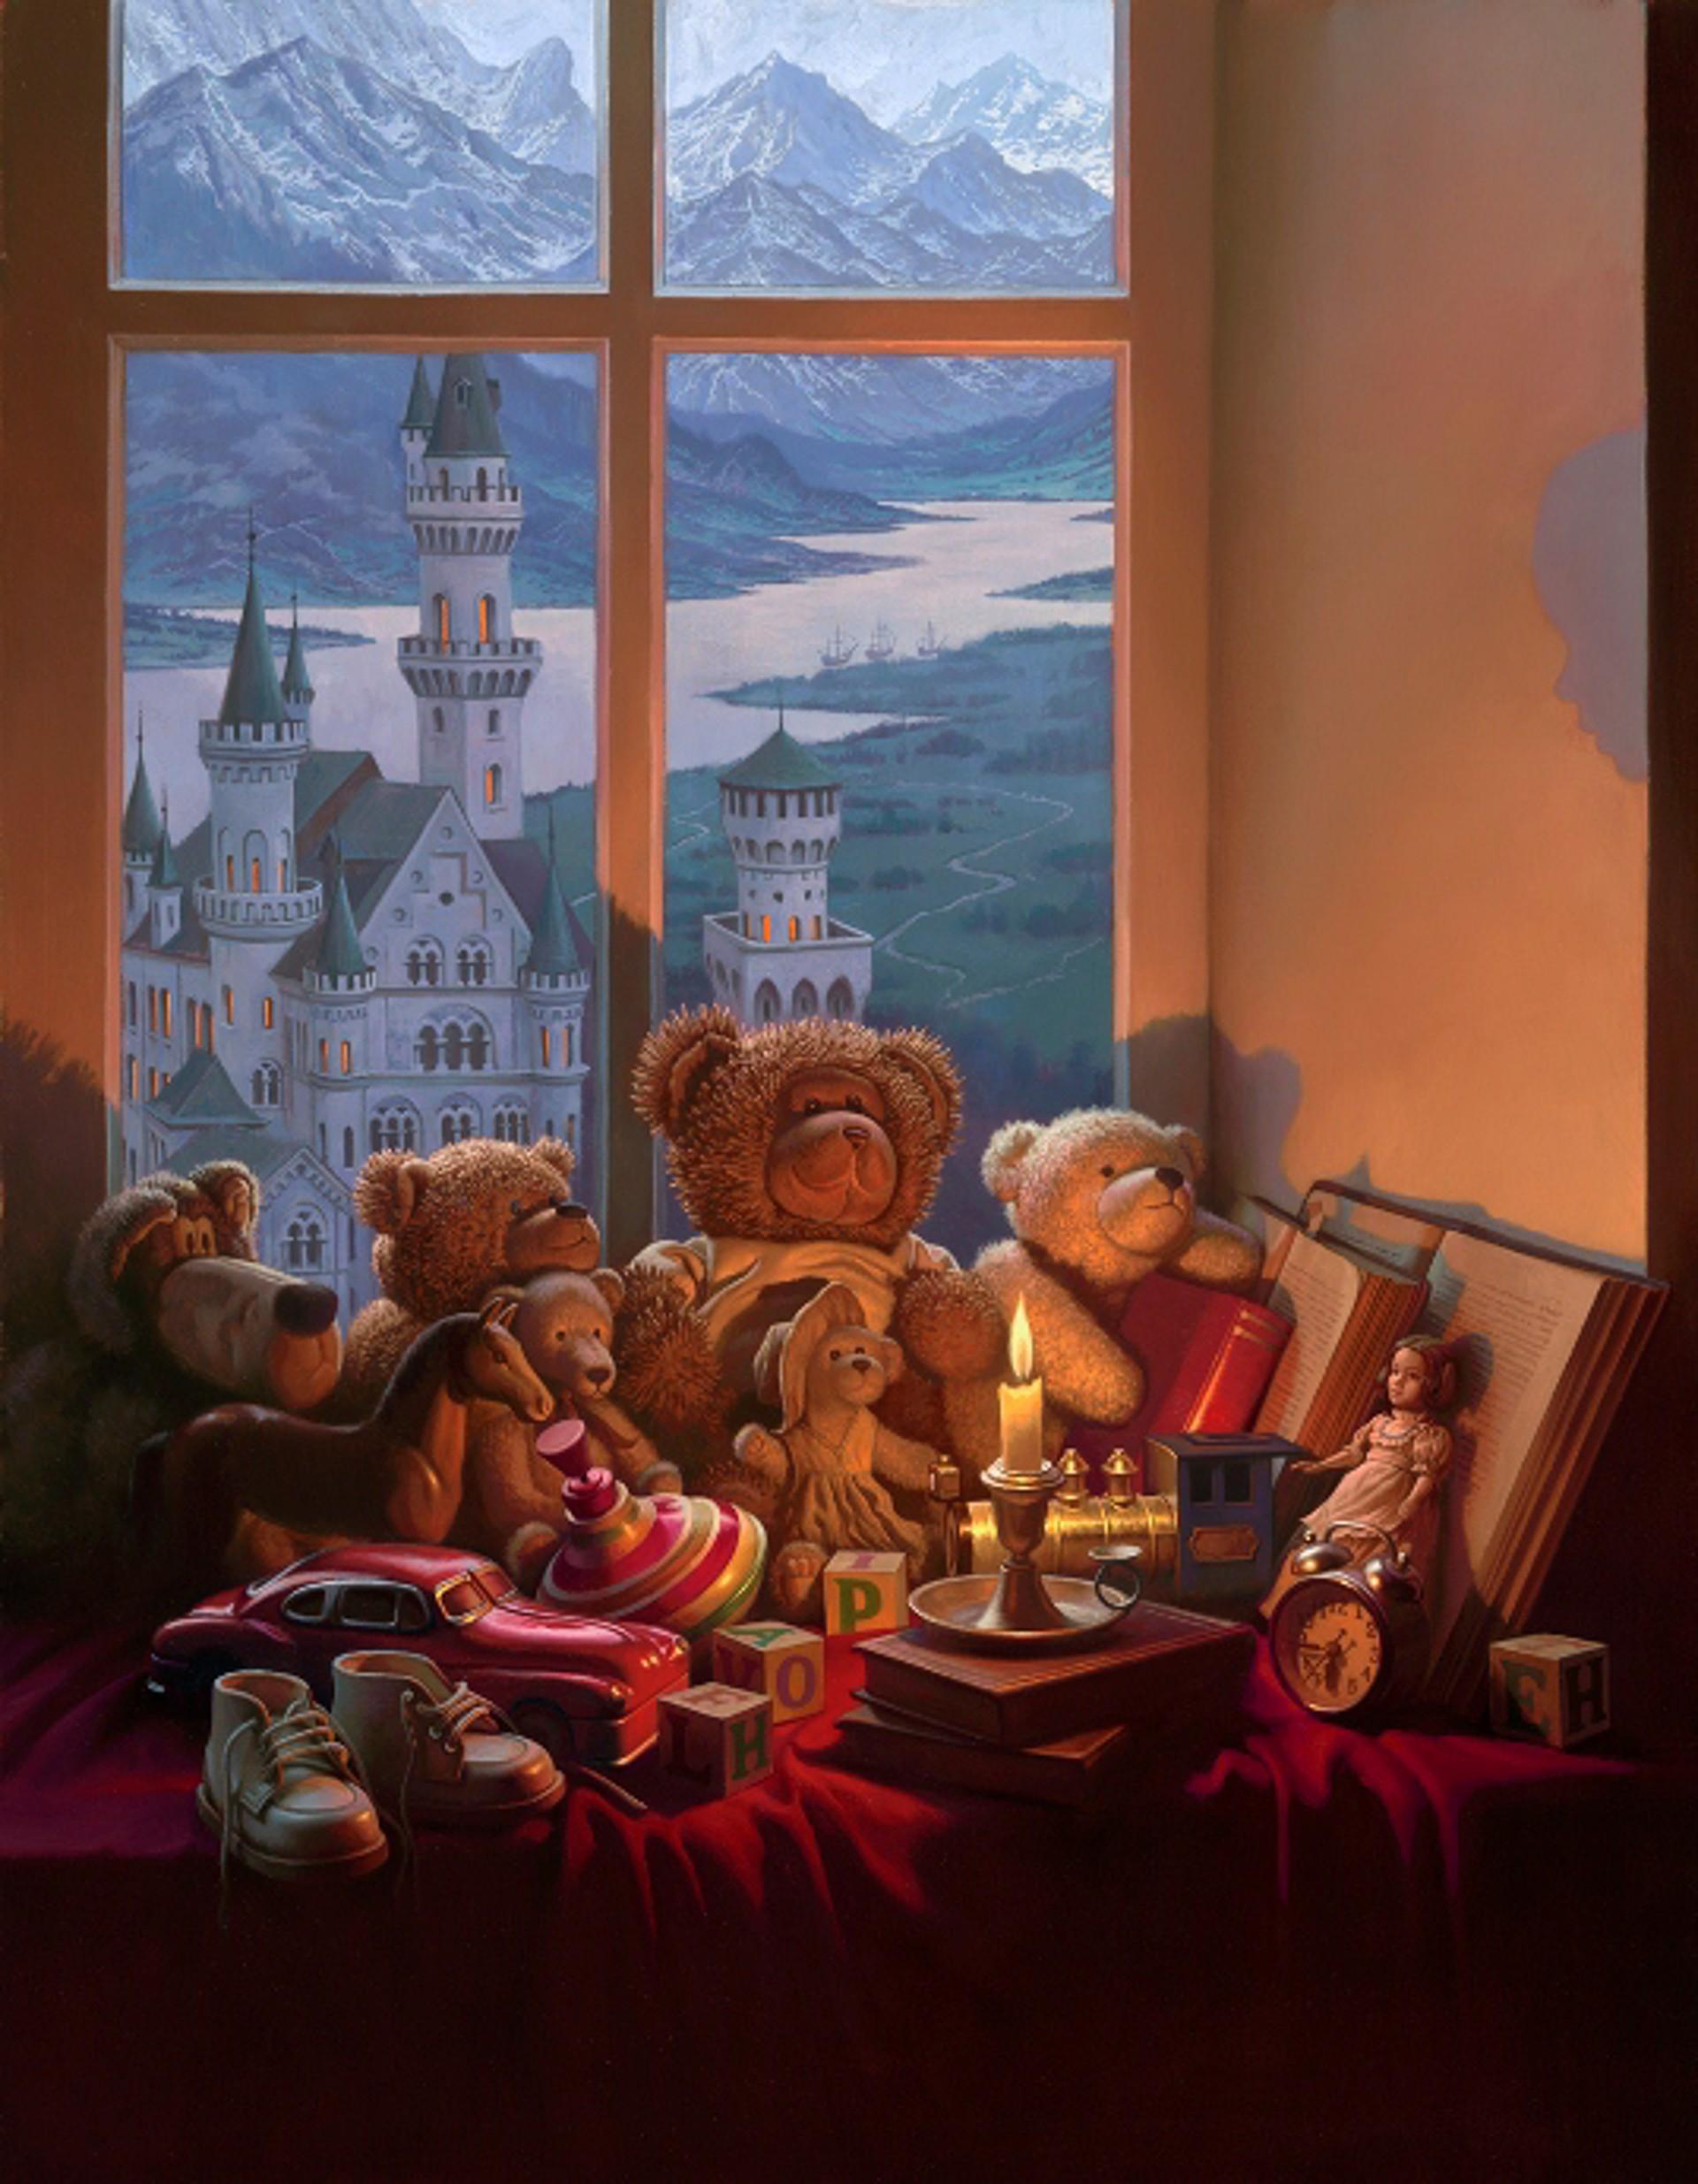 Through the Eyes of a Child by Alexei Butirskiy